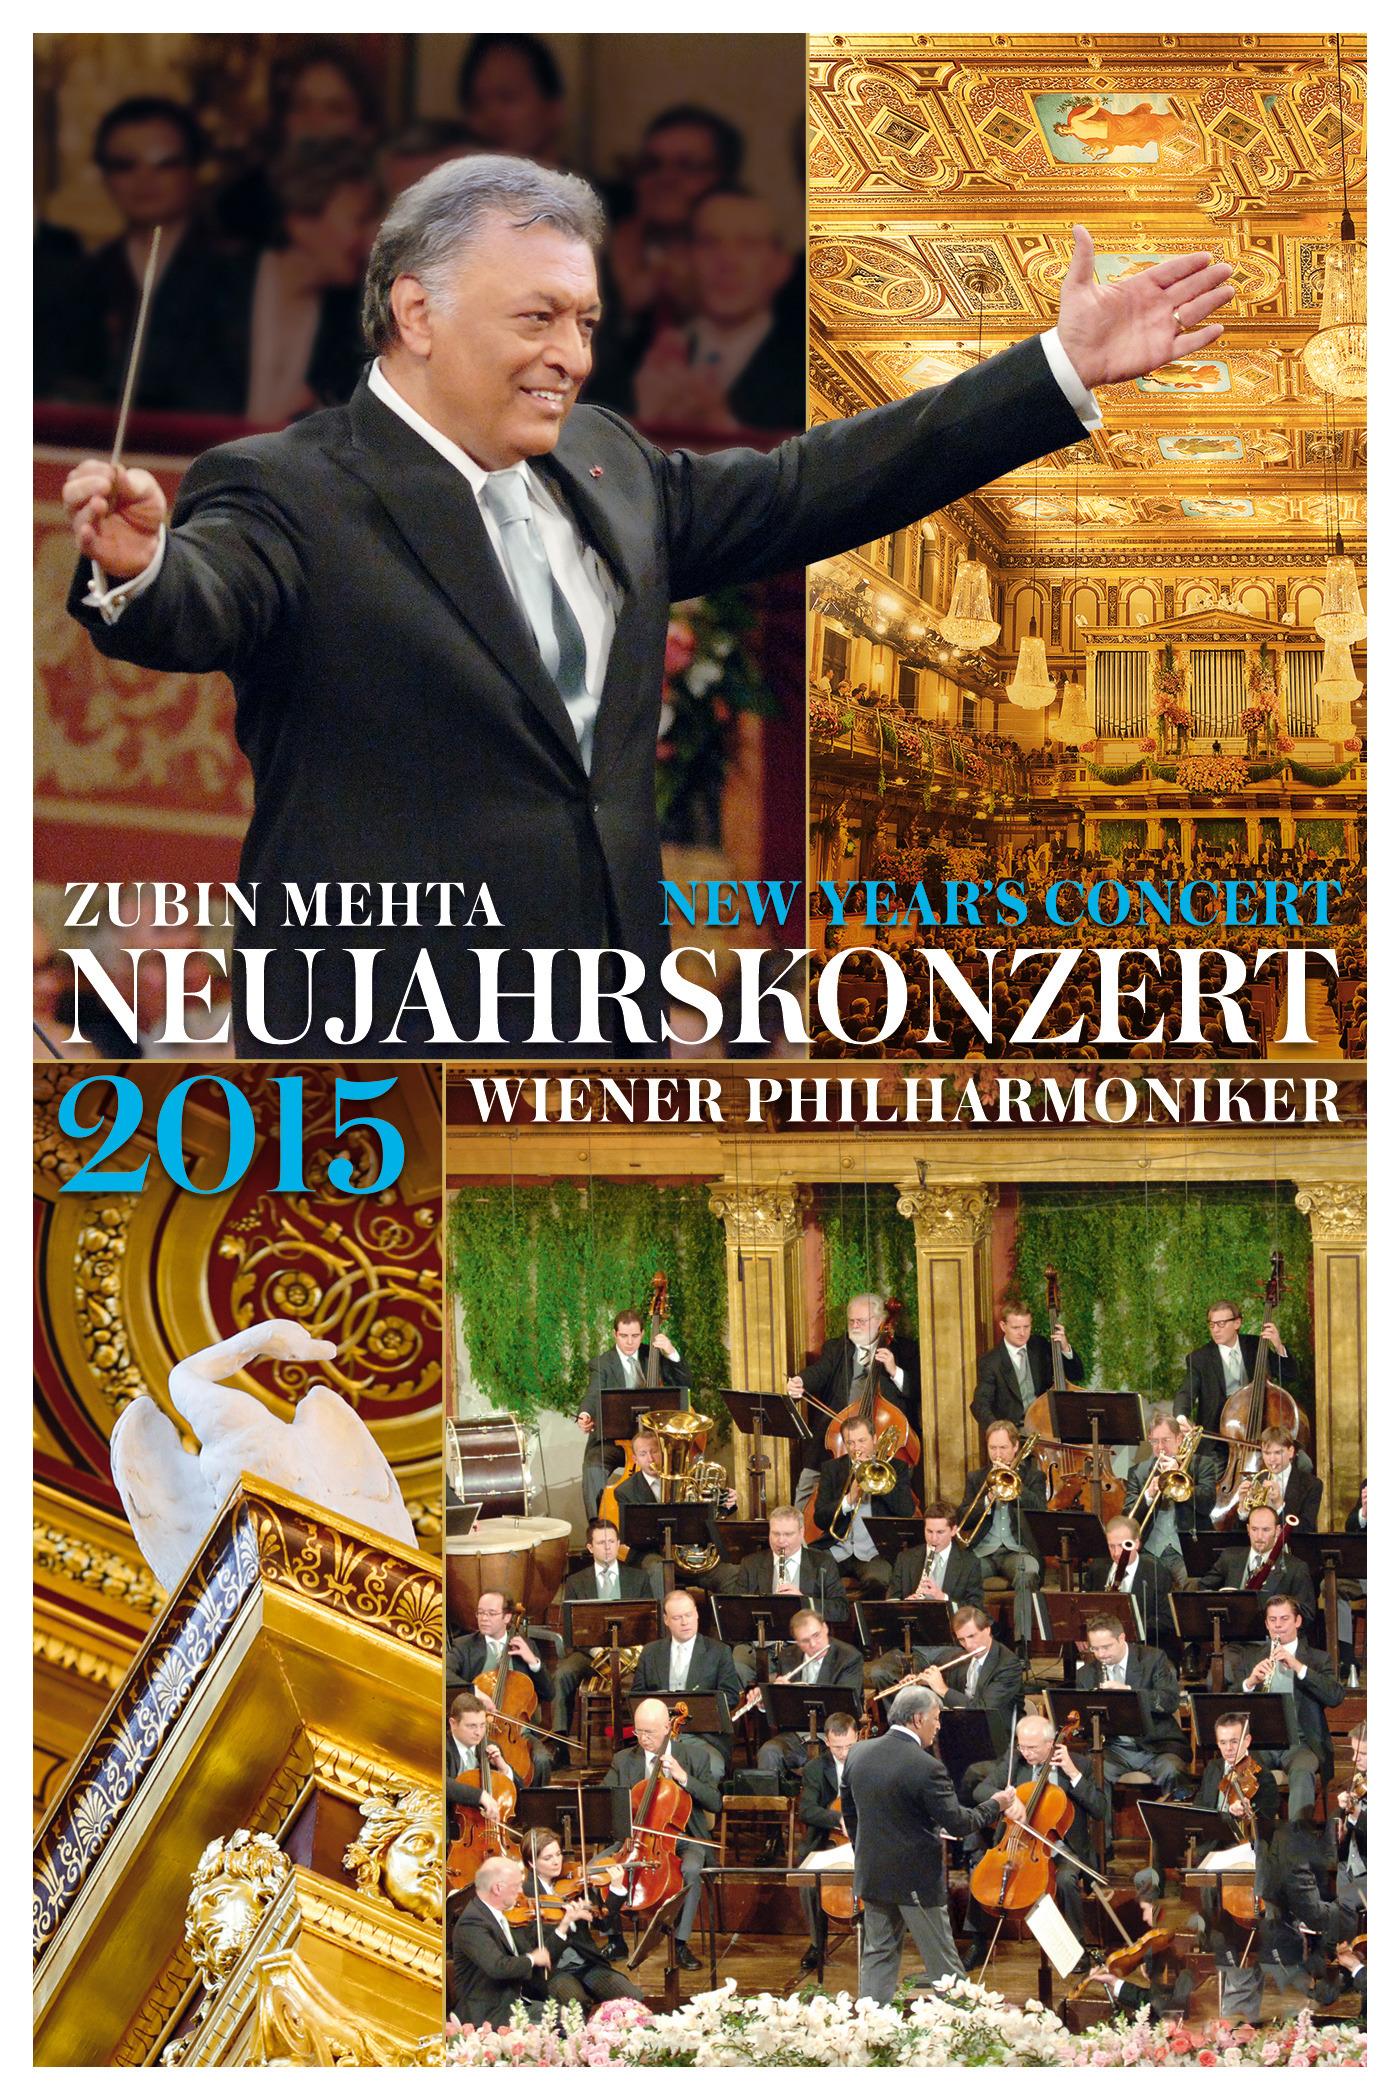 Zubin Mehta & Wiener Philharmoniker: Neujahrskonzert 2015 / New Year's Concert 2015